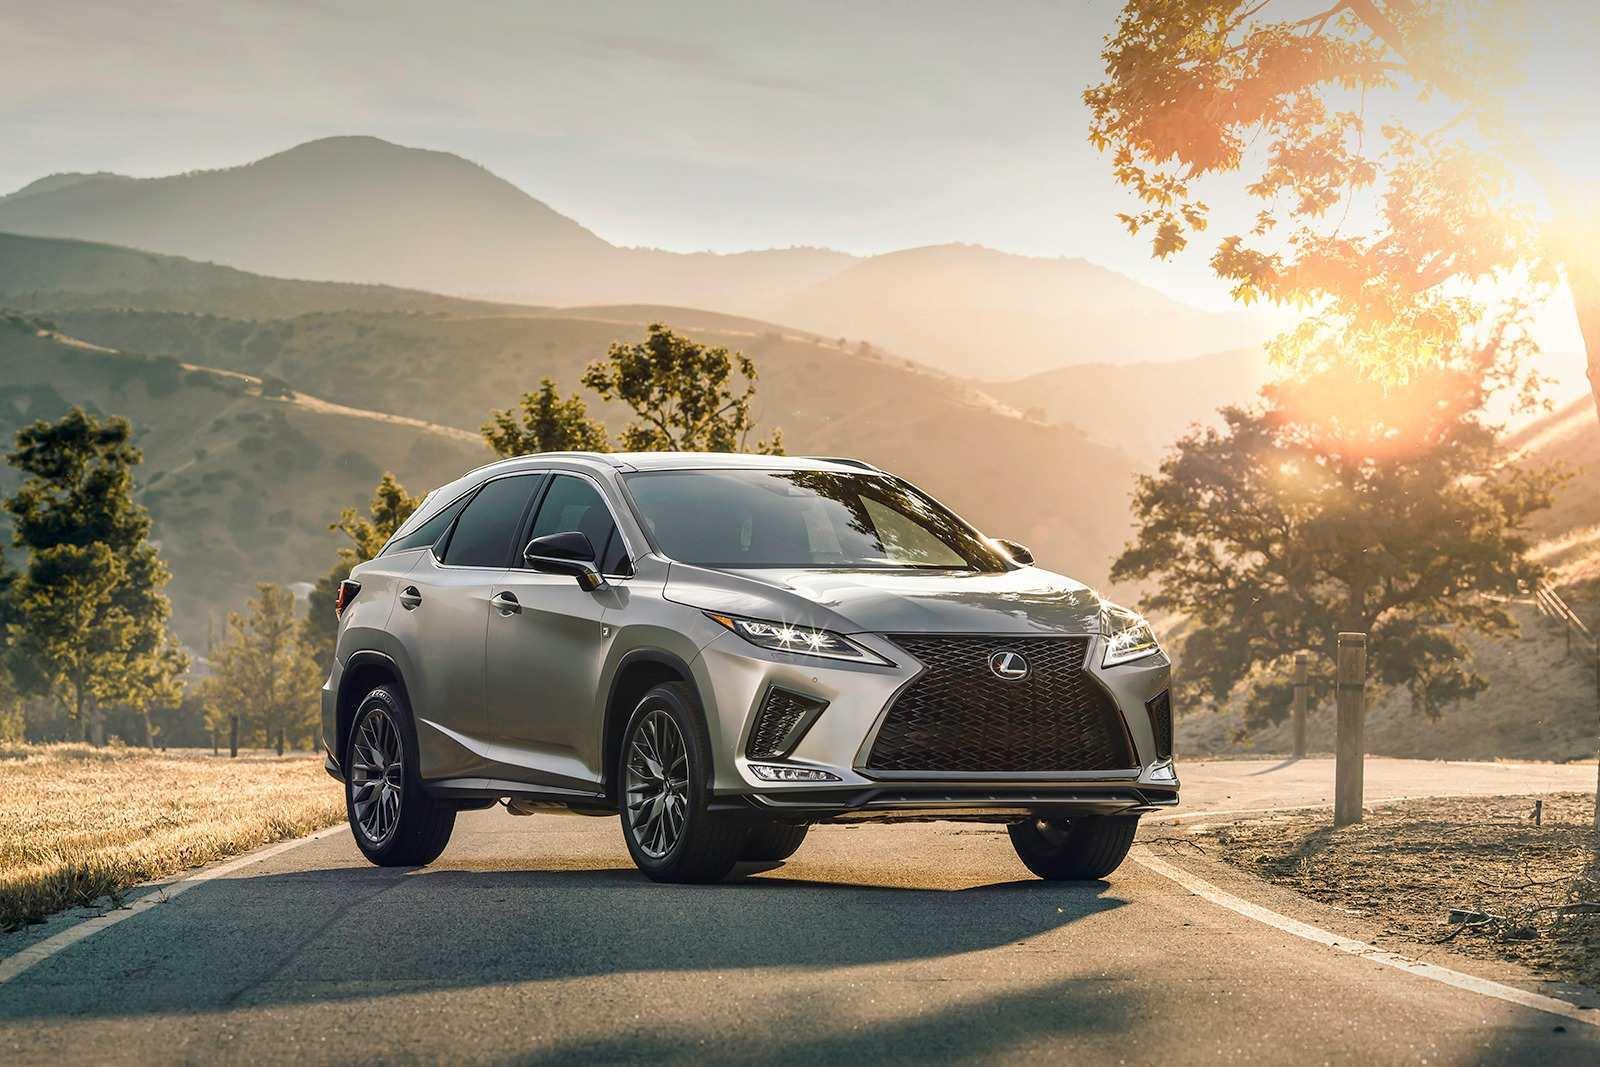 94 Concept of 2020 Lexus Es Hybrid Performance and New Engine with 2020 Lexus Es Hybrid